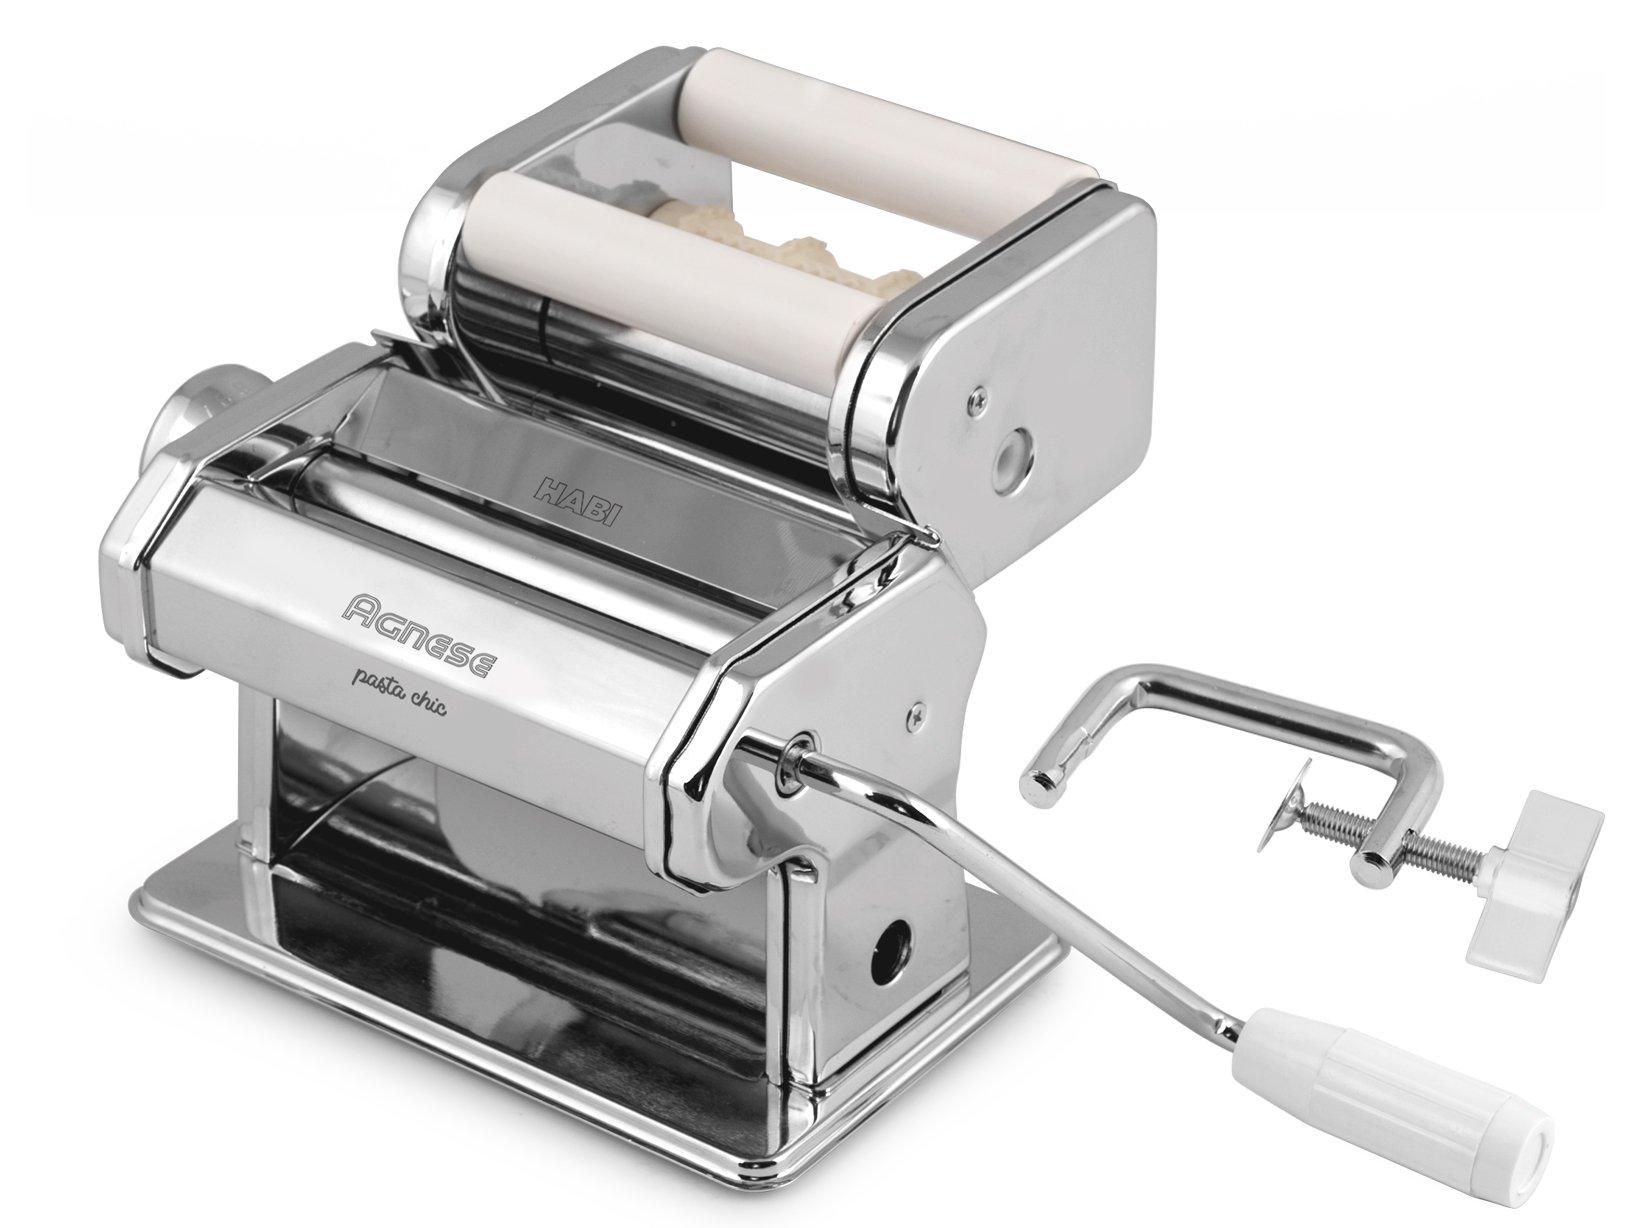 Habi 8409600 Macchina Pasta per Ravioli, 150 mm, Inossidabile, Acciaio